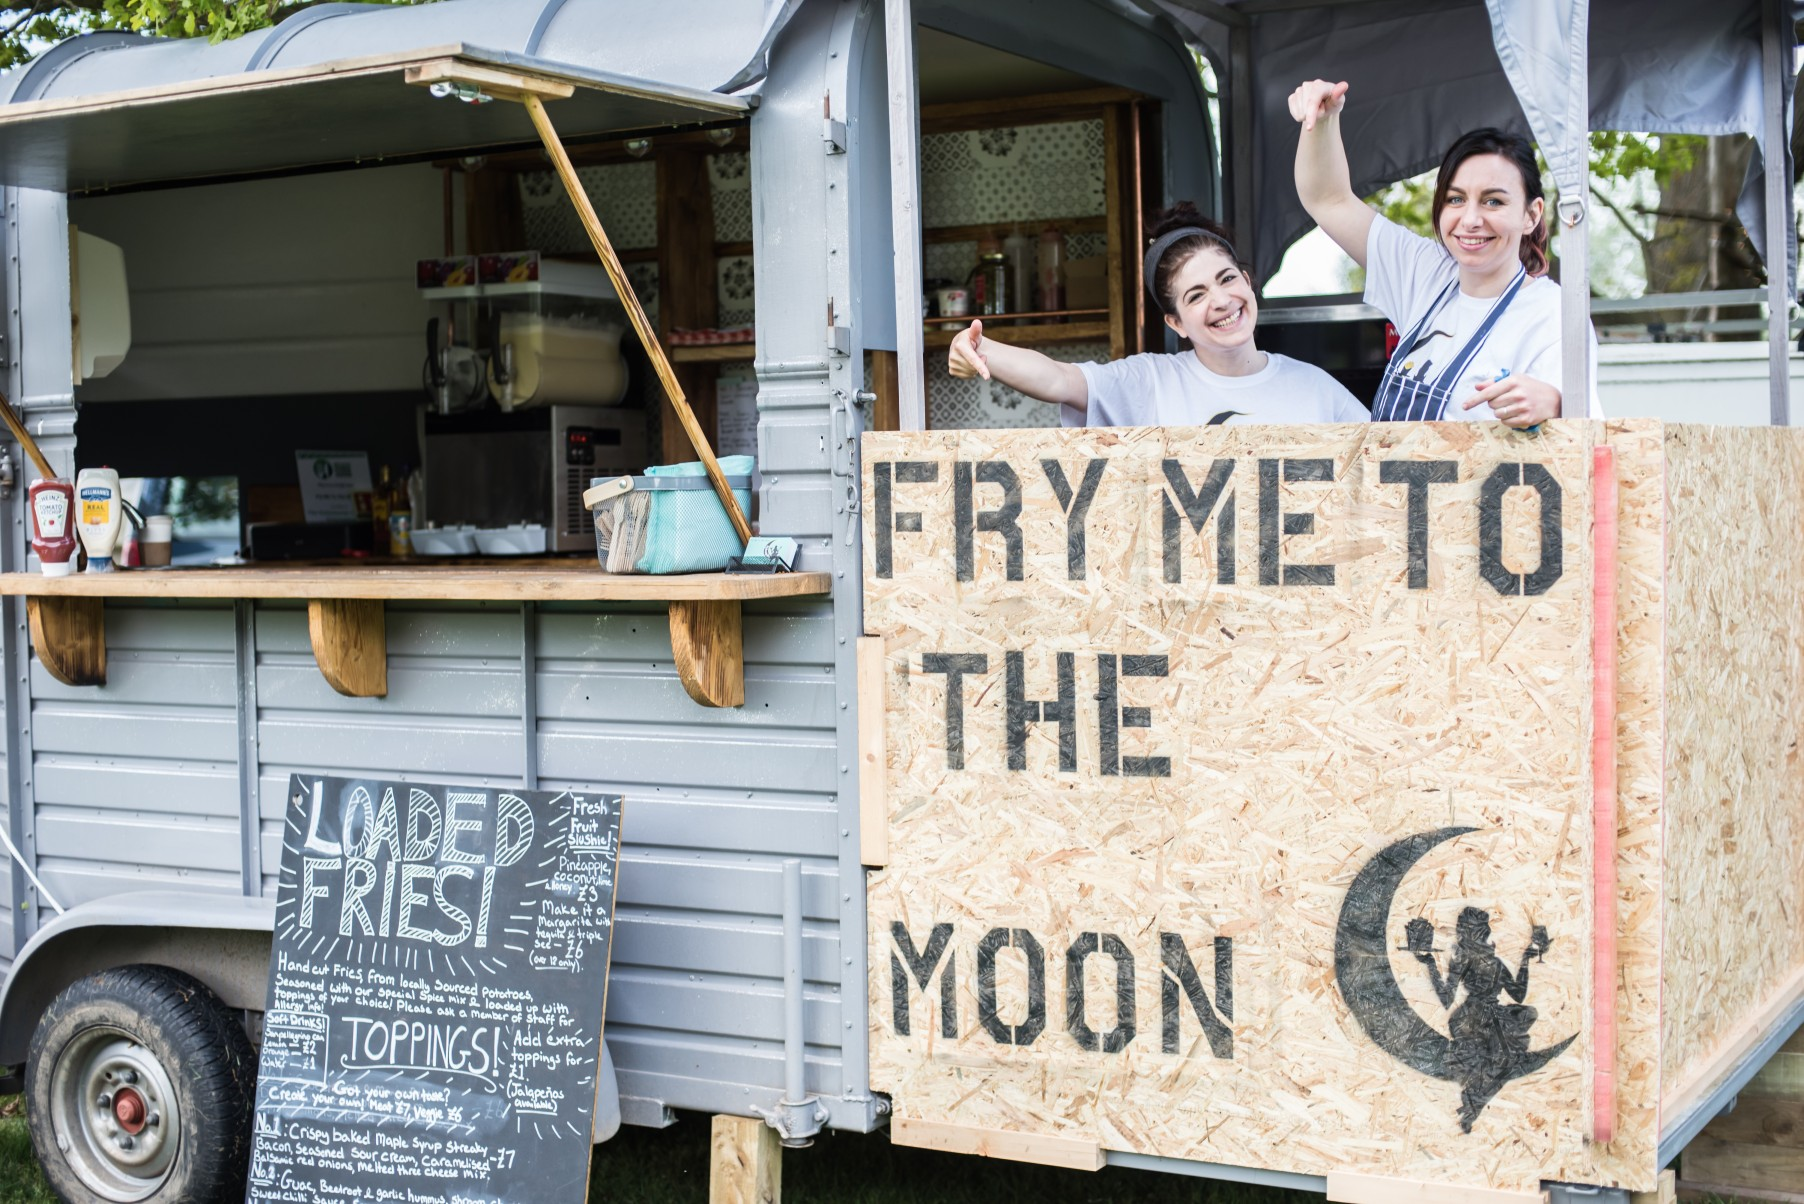 Festival wedding - Unconventional Wedding Festival - Fry me to the moon - wedding food van (2)